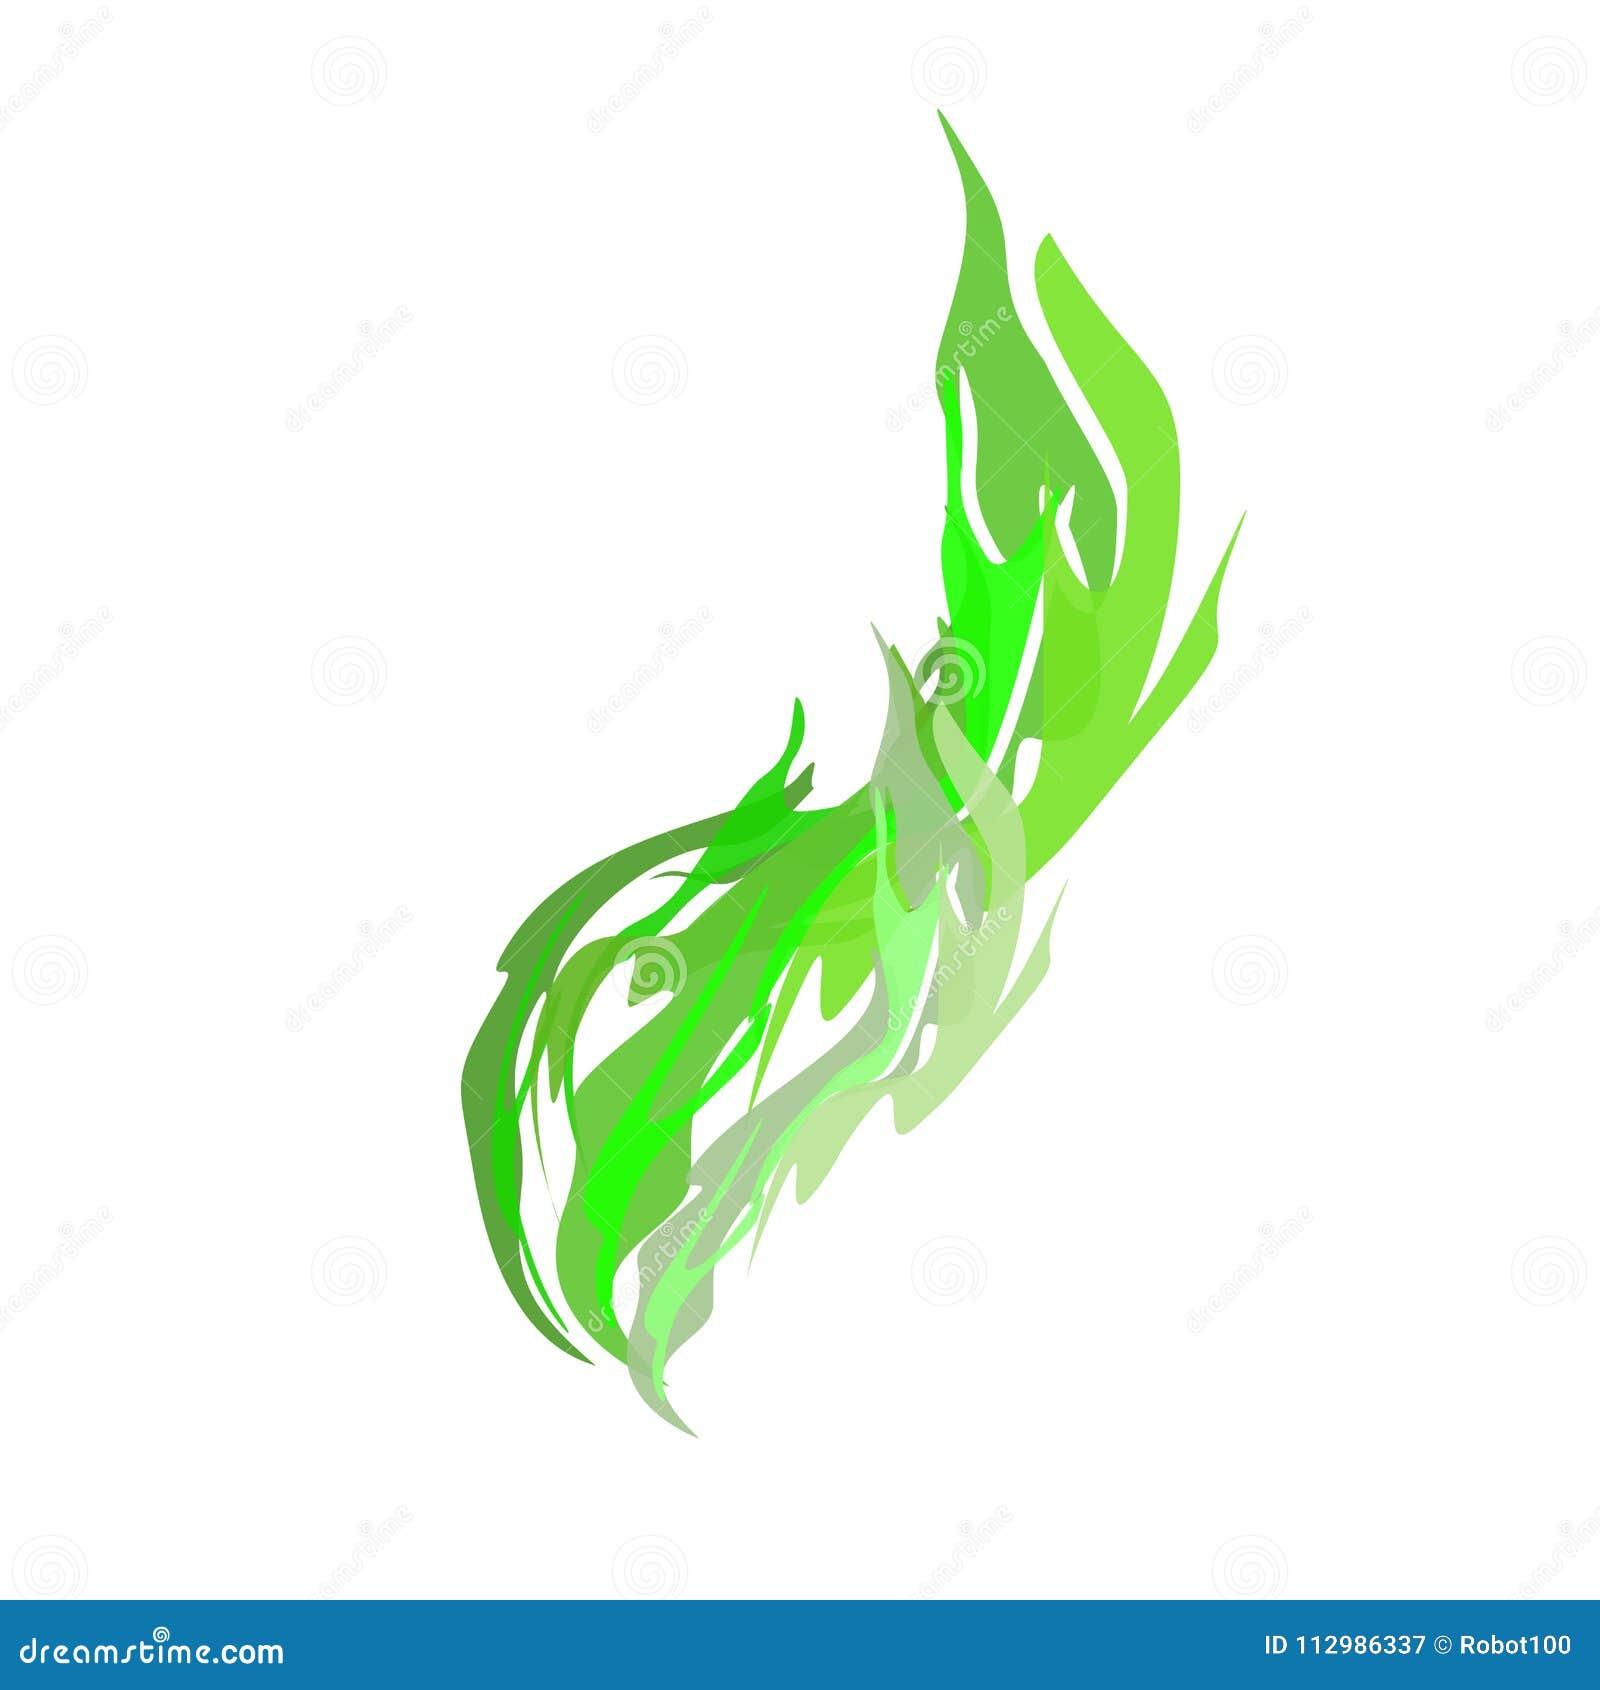 Acidic smoke Green isolated. Chemical evaporation. Vector illustration